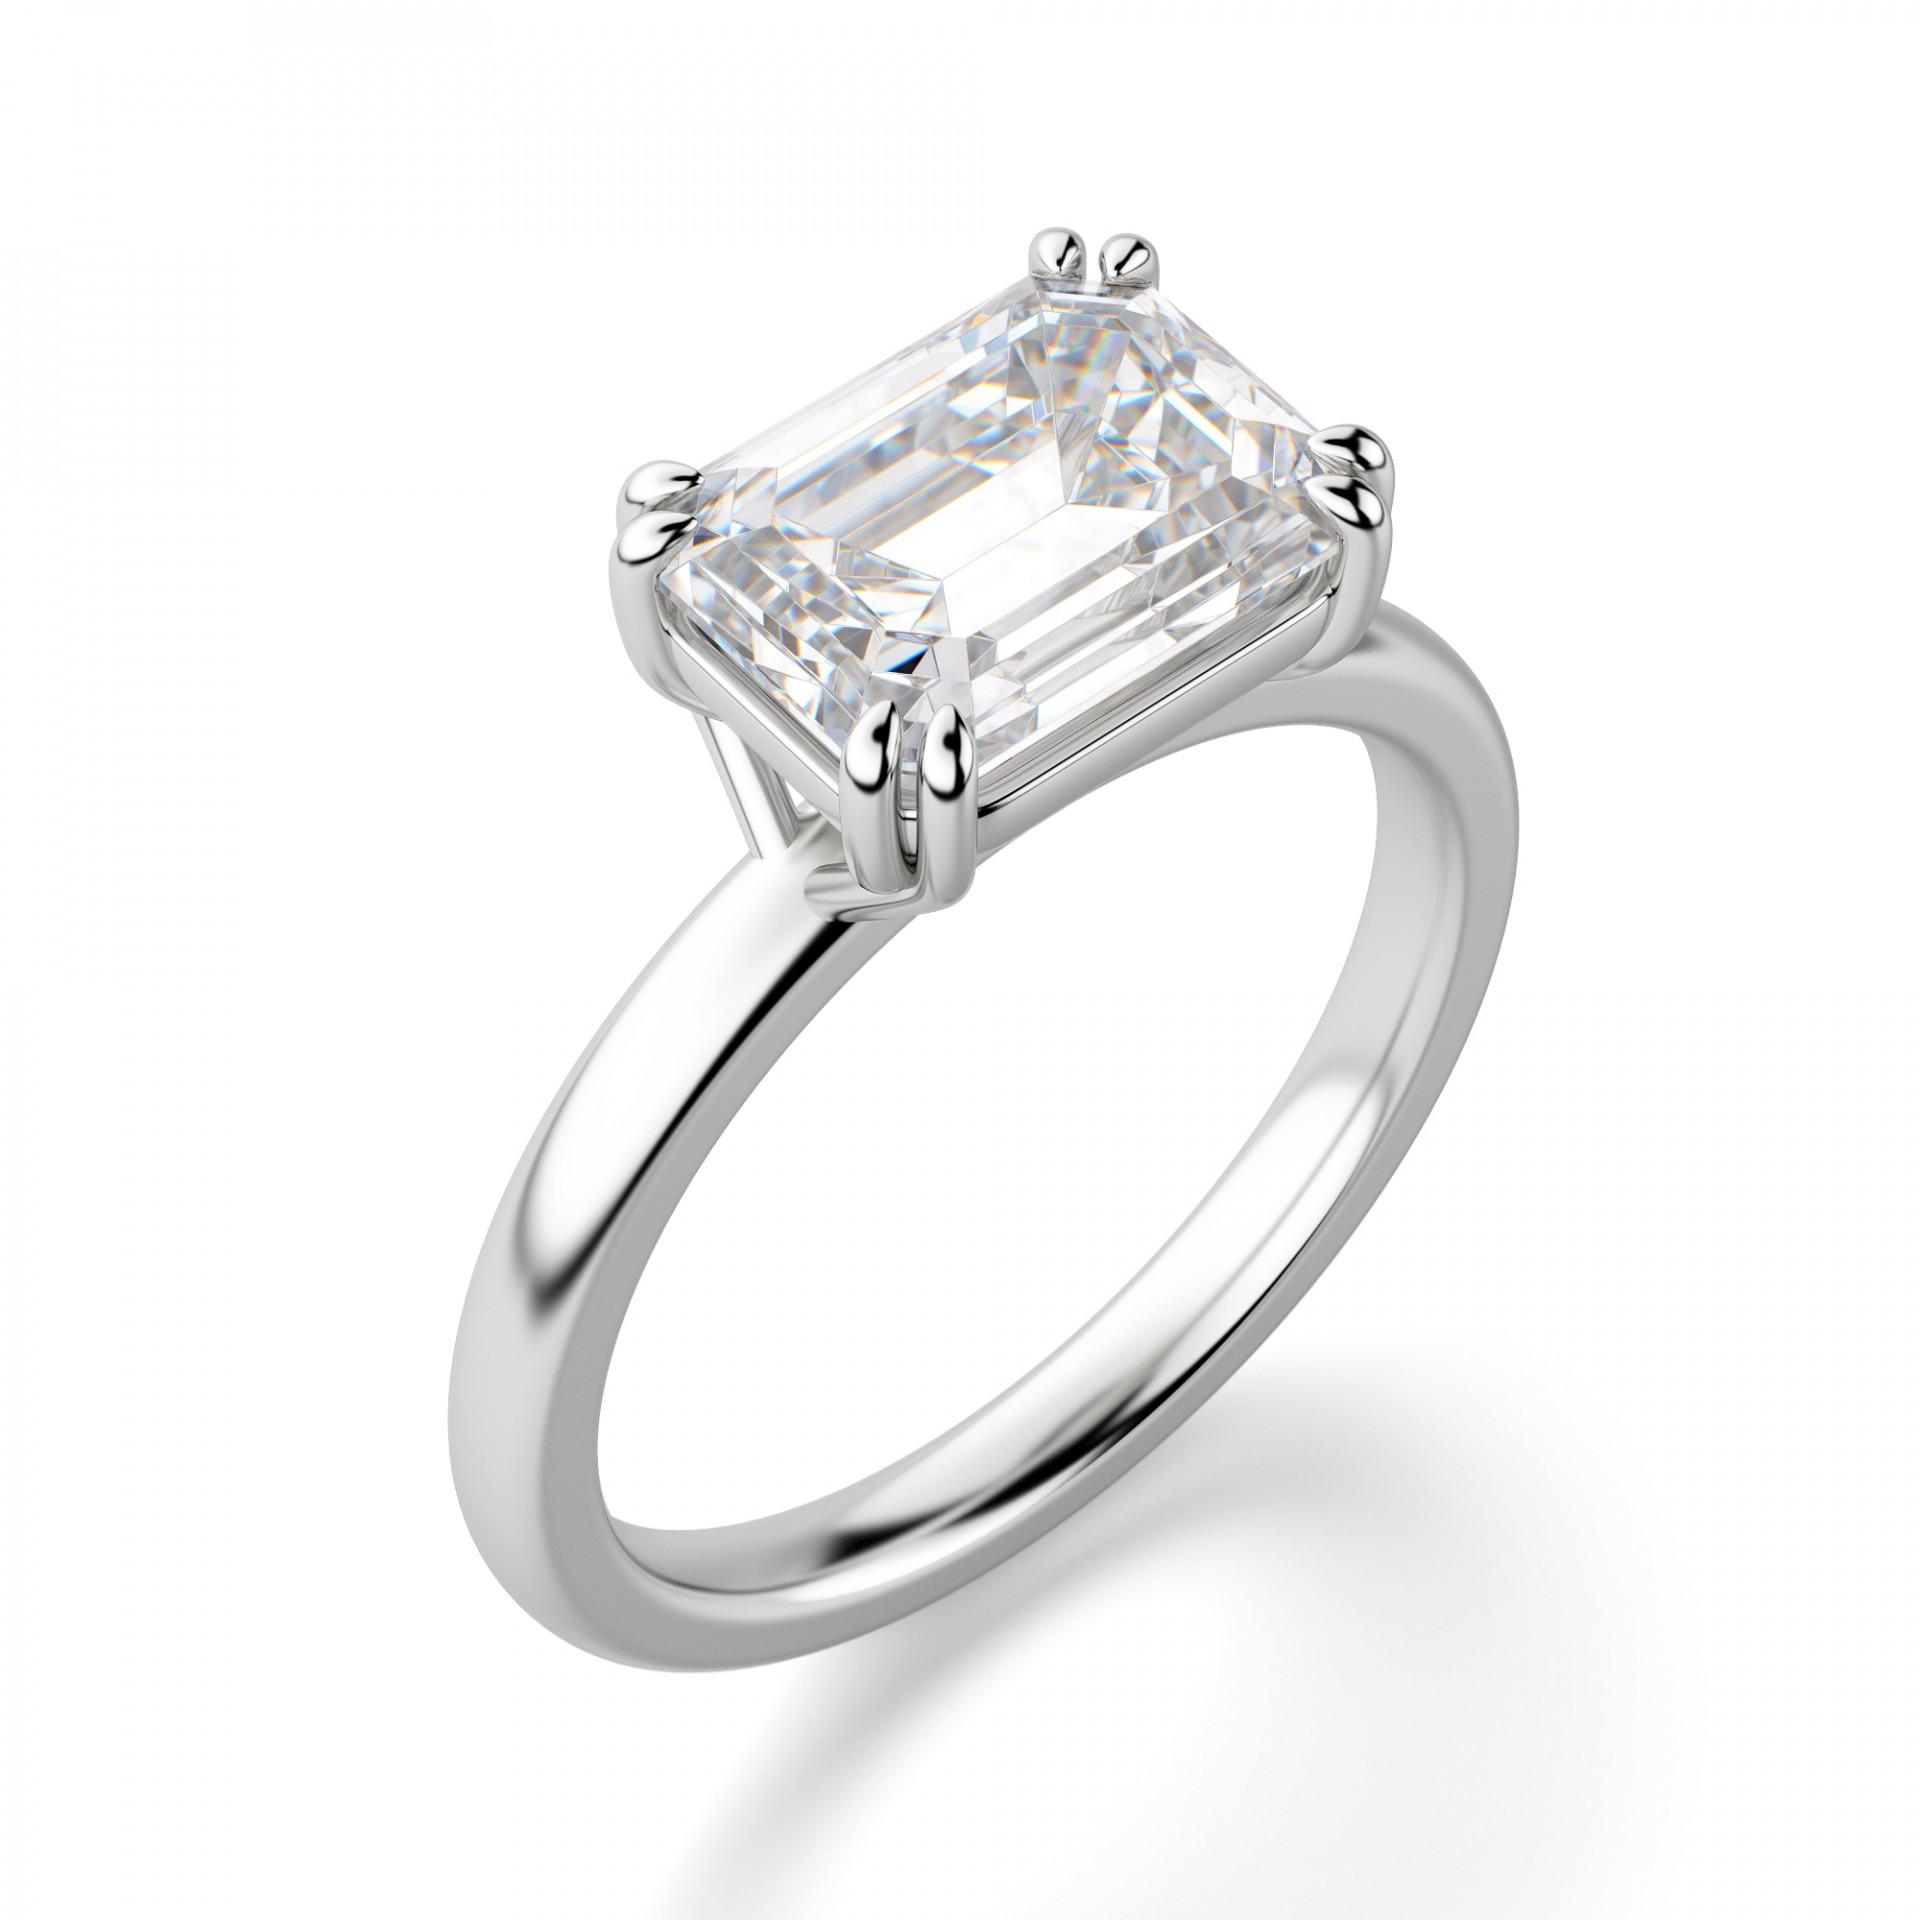 east west classic emerald cut engagement ring engagement. Black Bedroom Furniture Sets. Home Design Ideas